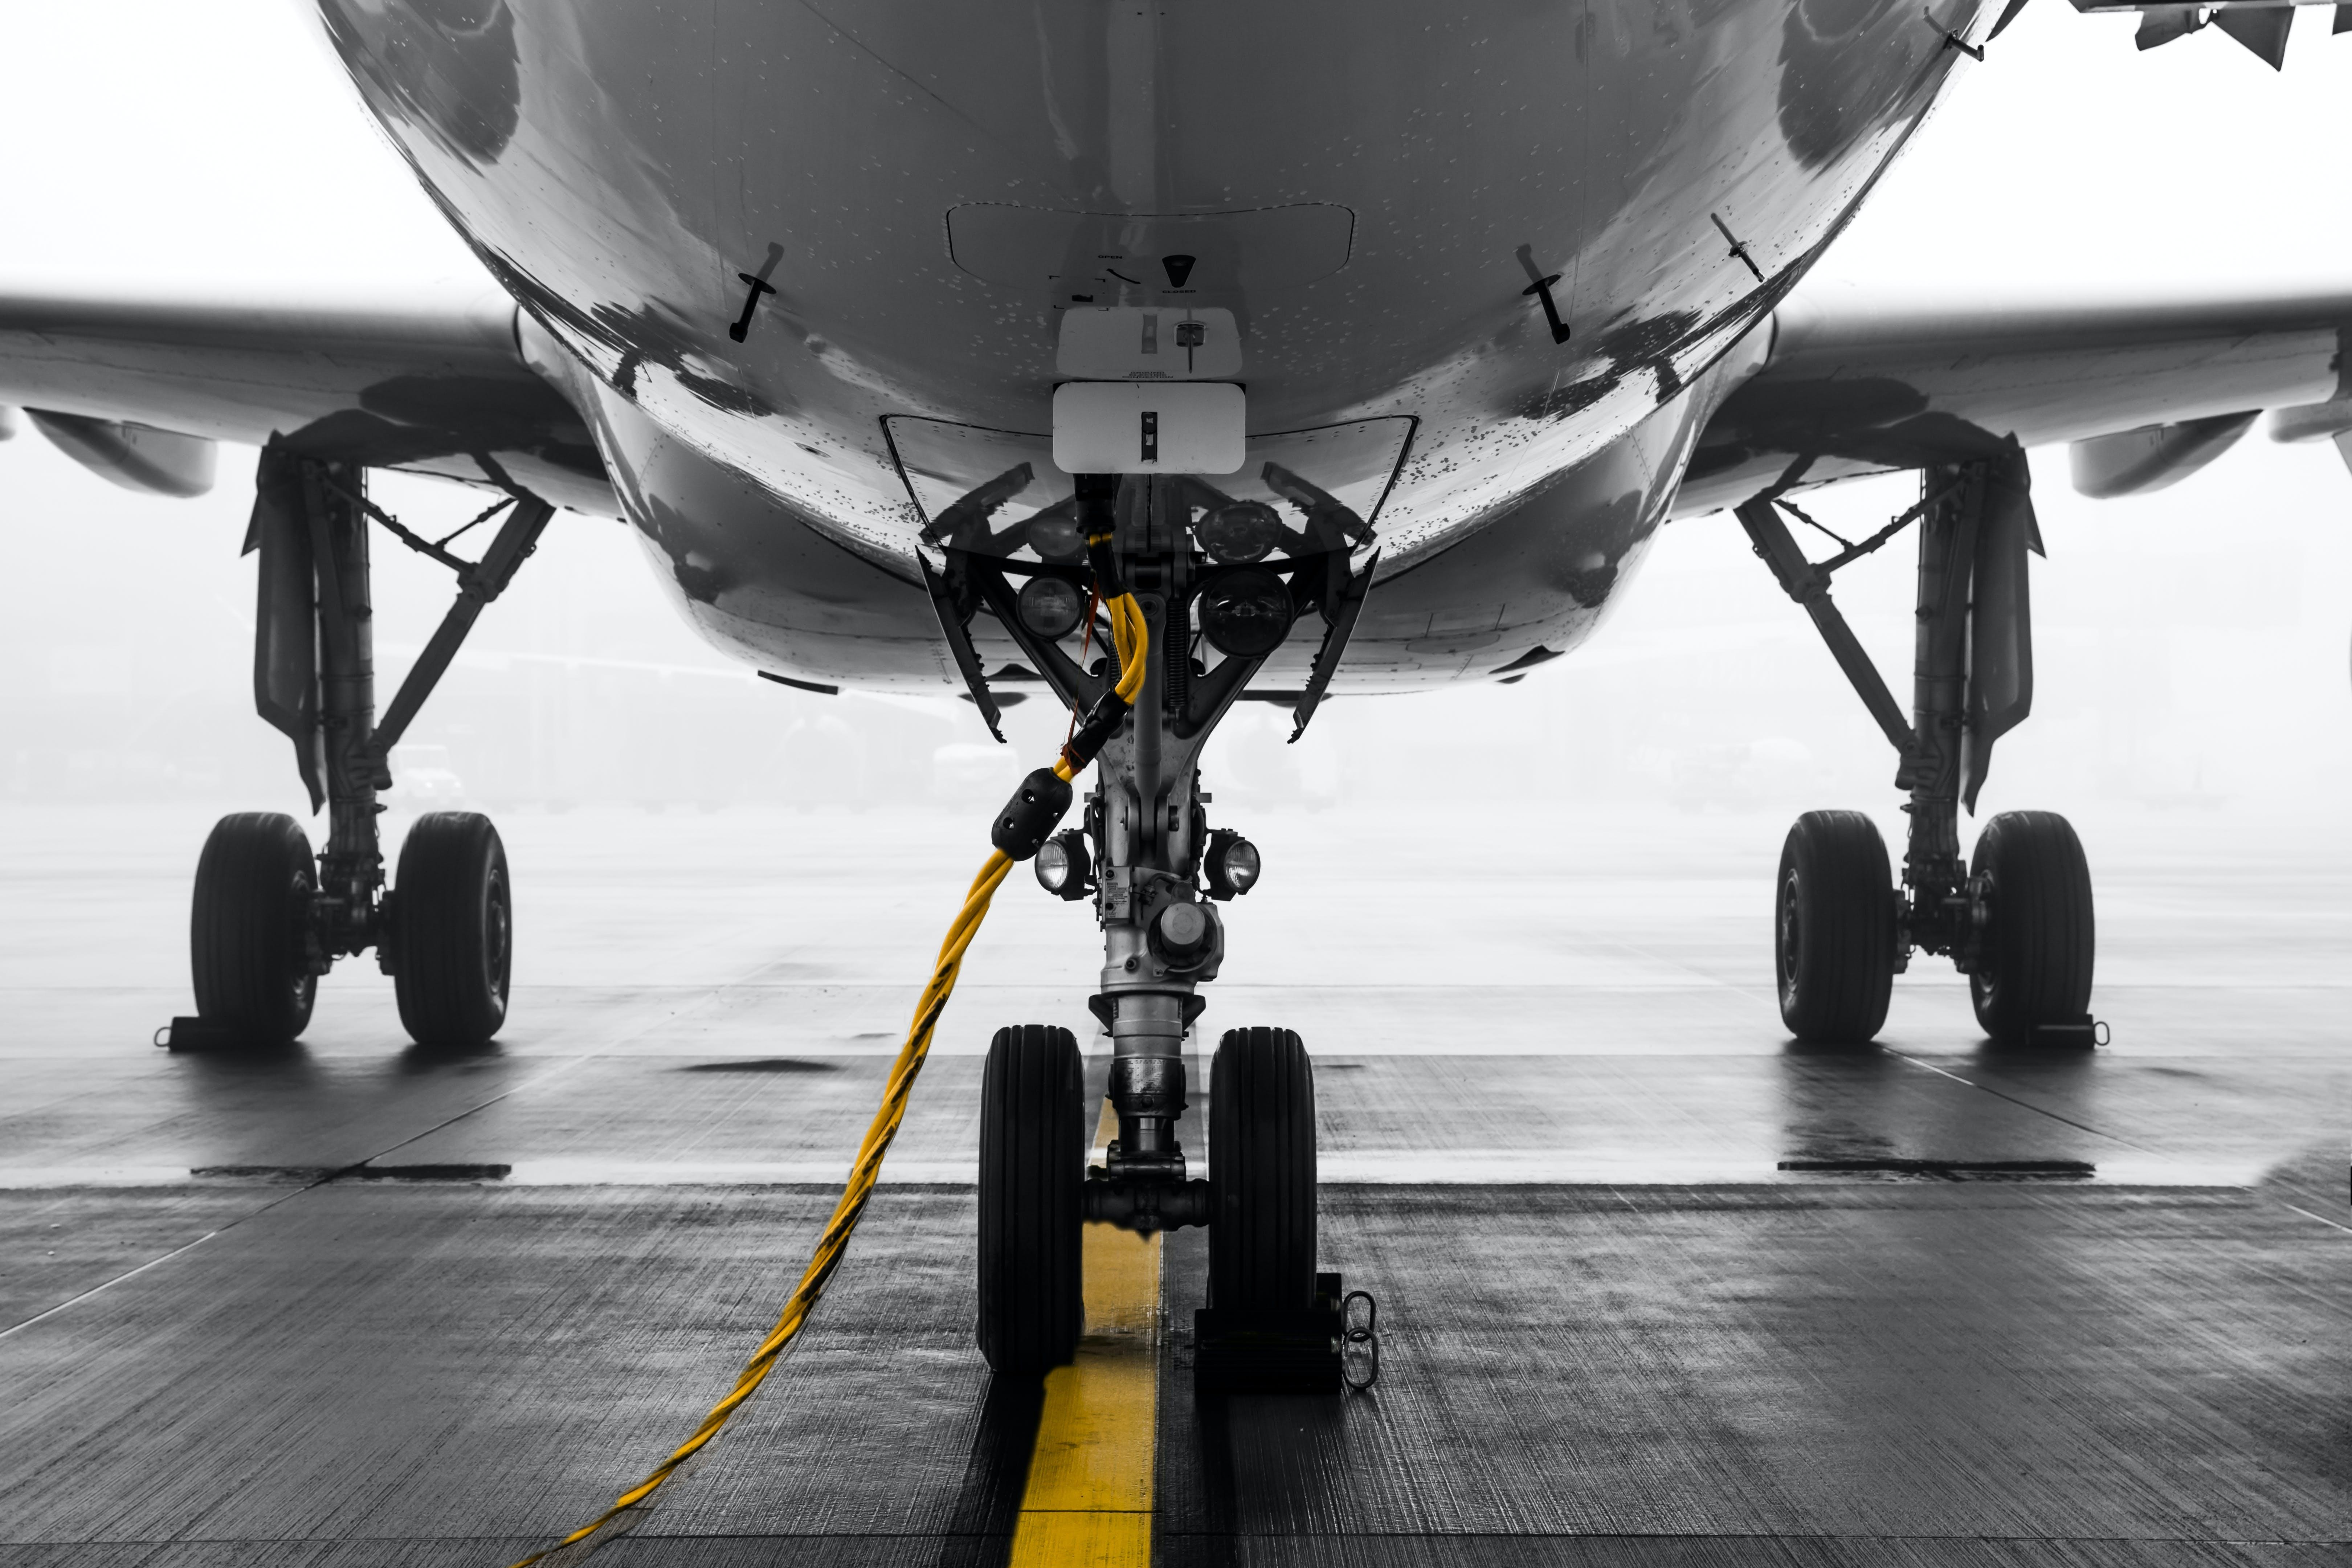 Kostenloses Stock Foto zu bürgersteig, düsenflugzeug, fahrbahn, fahrzeug